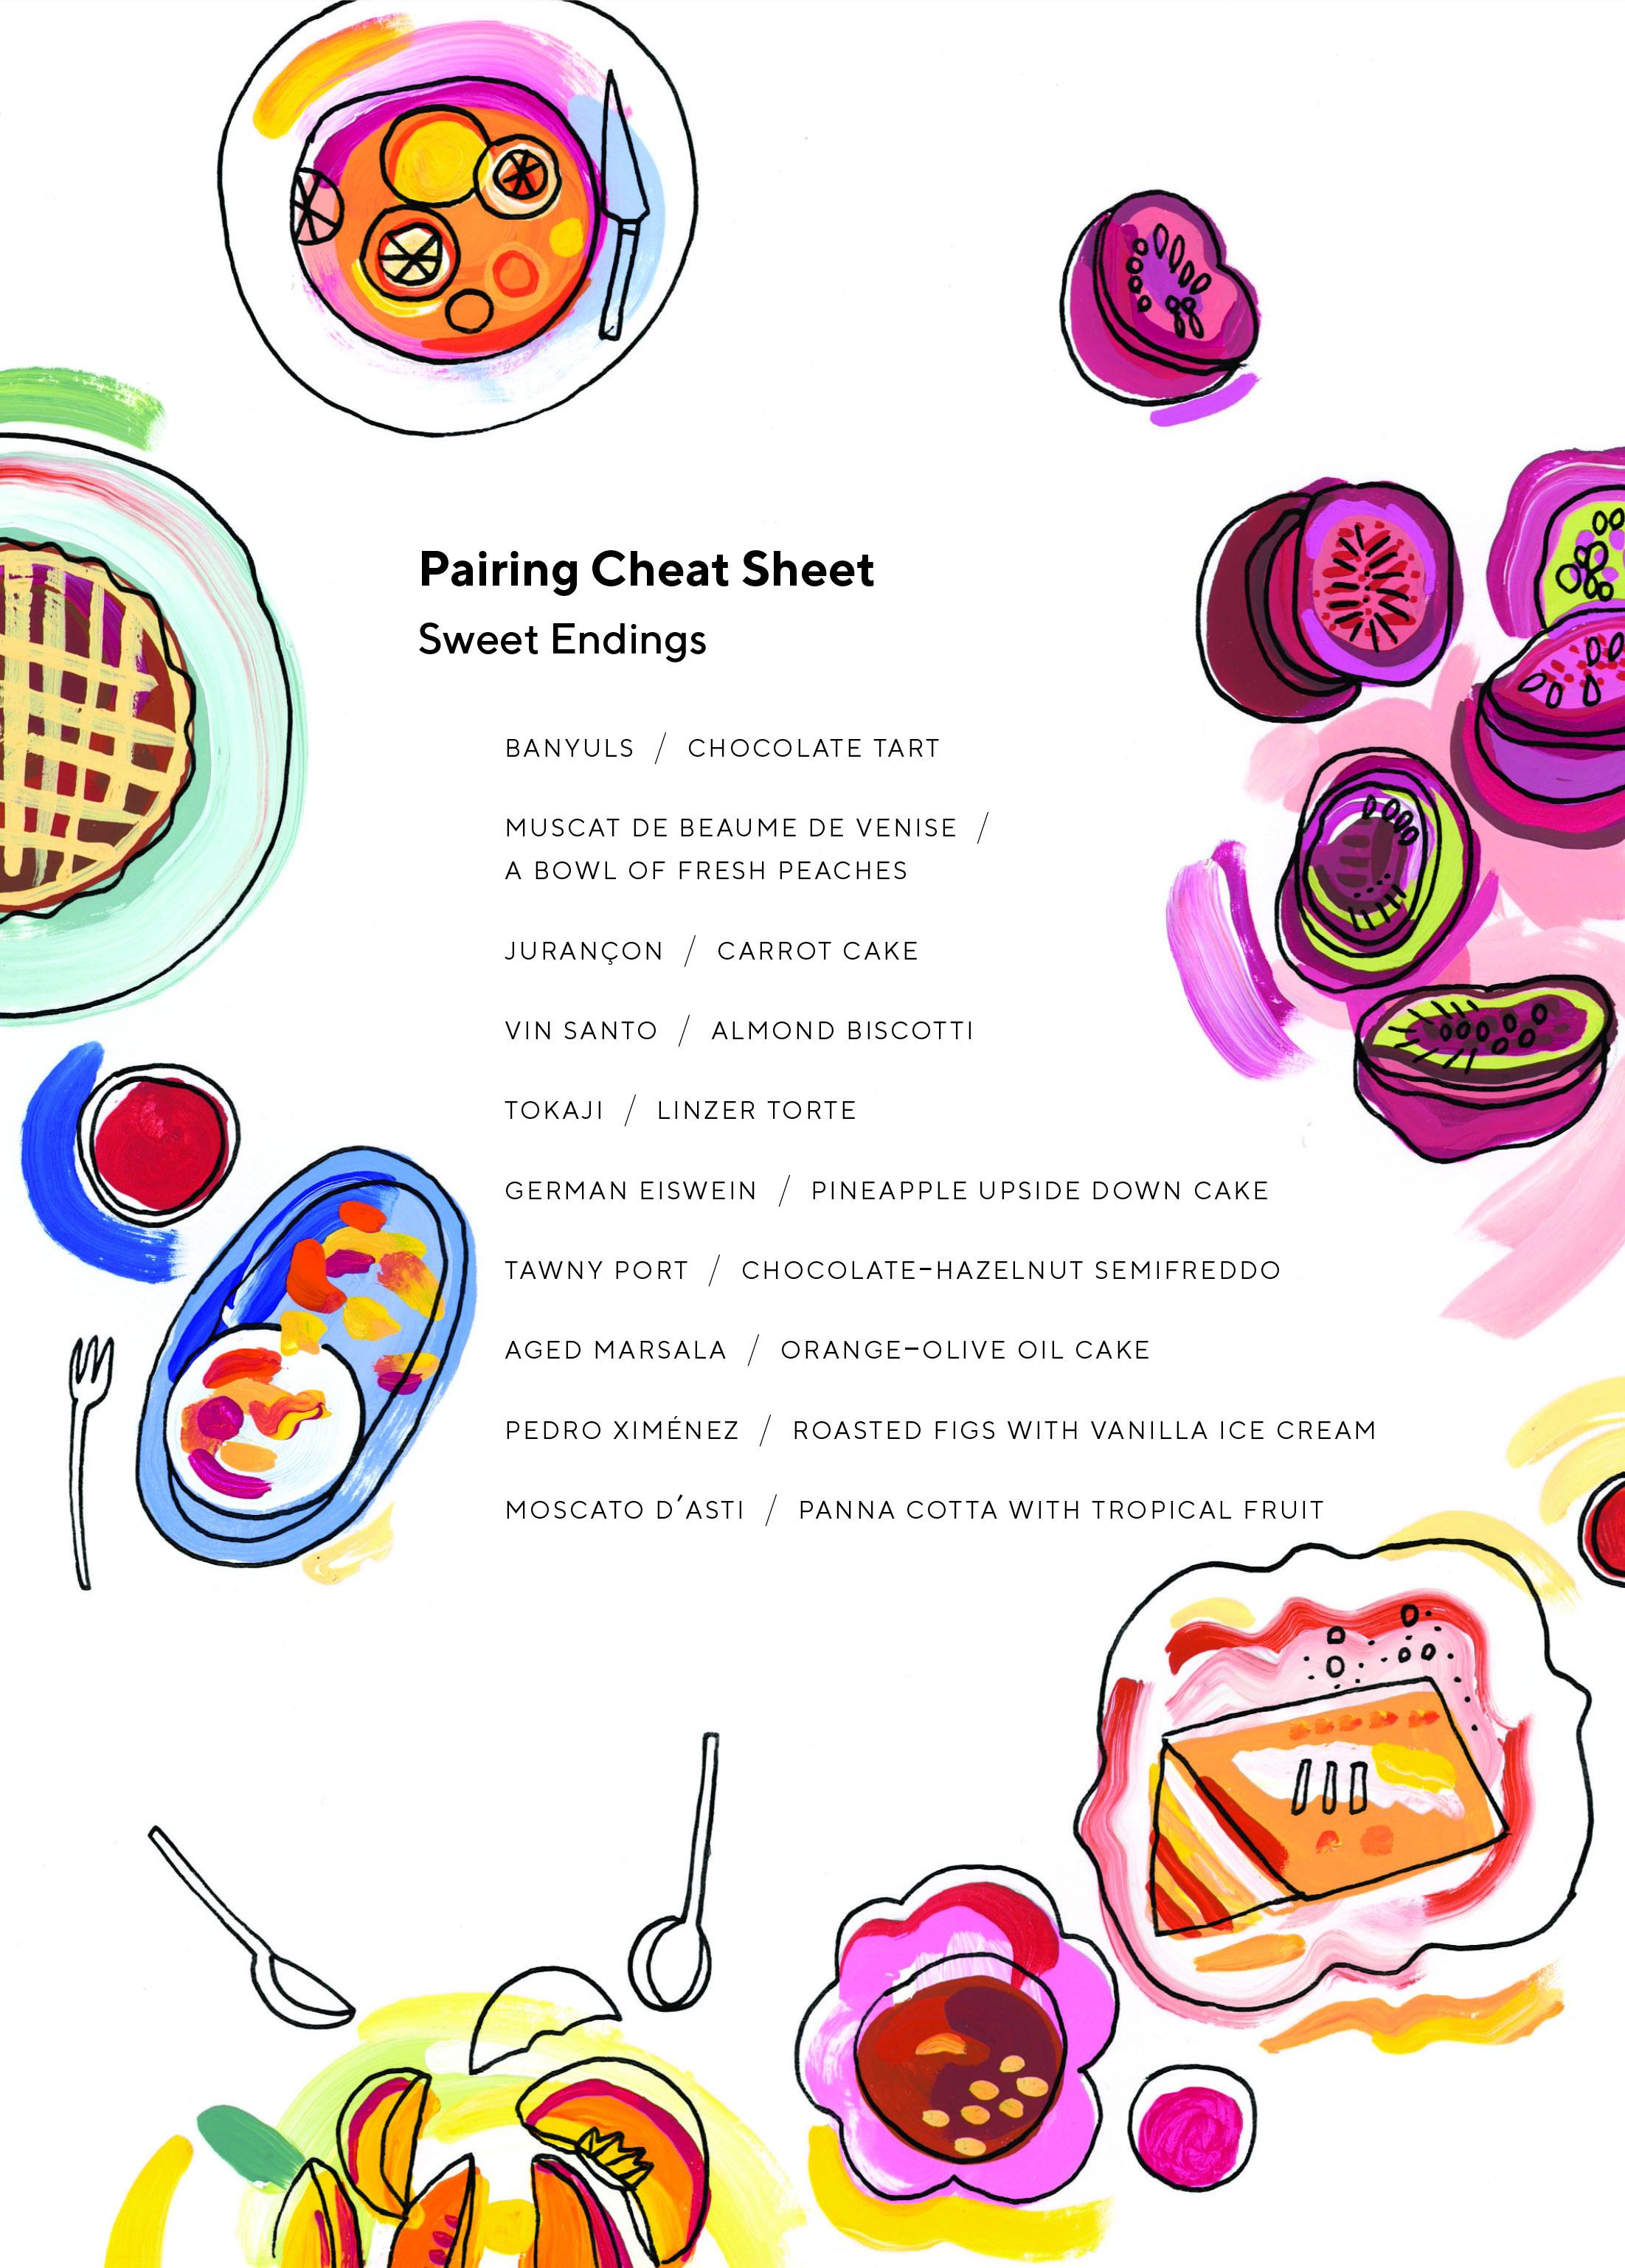 dessert pairing image.jpg